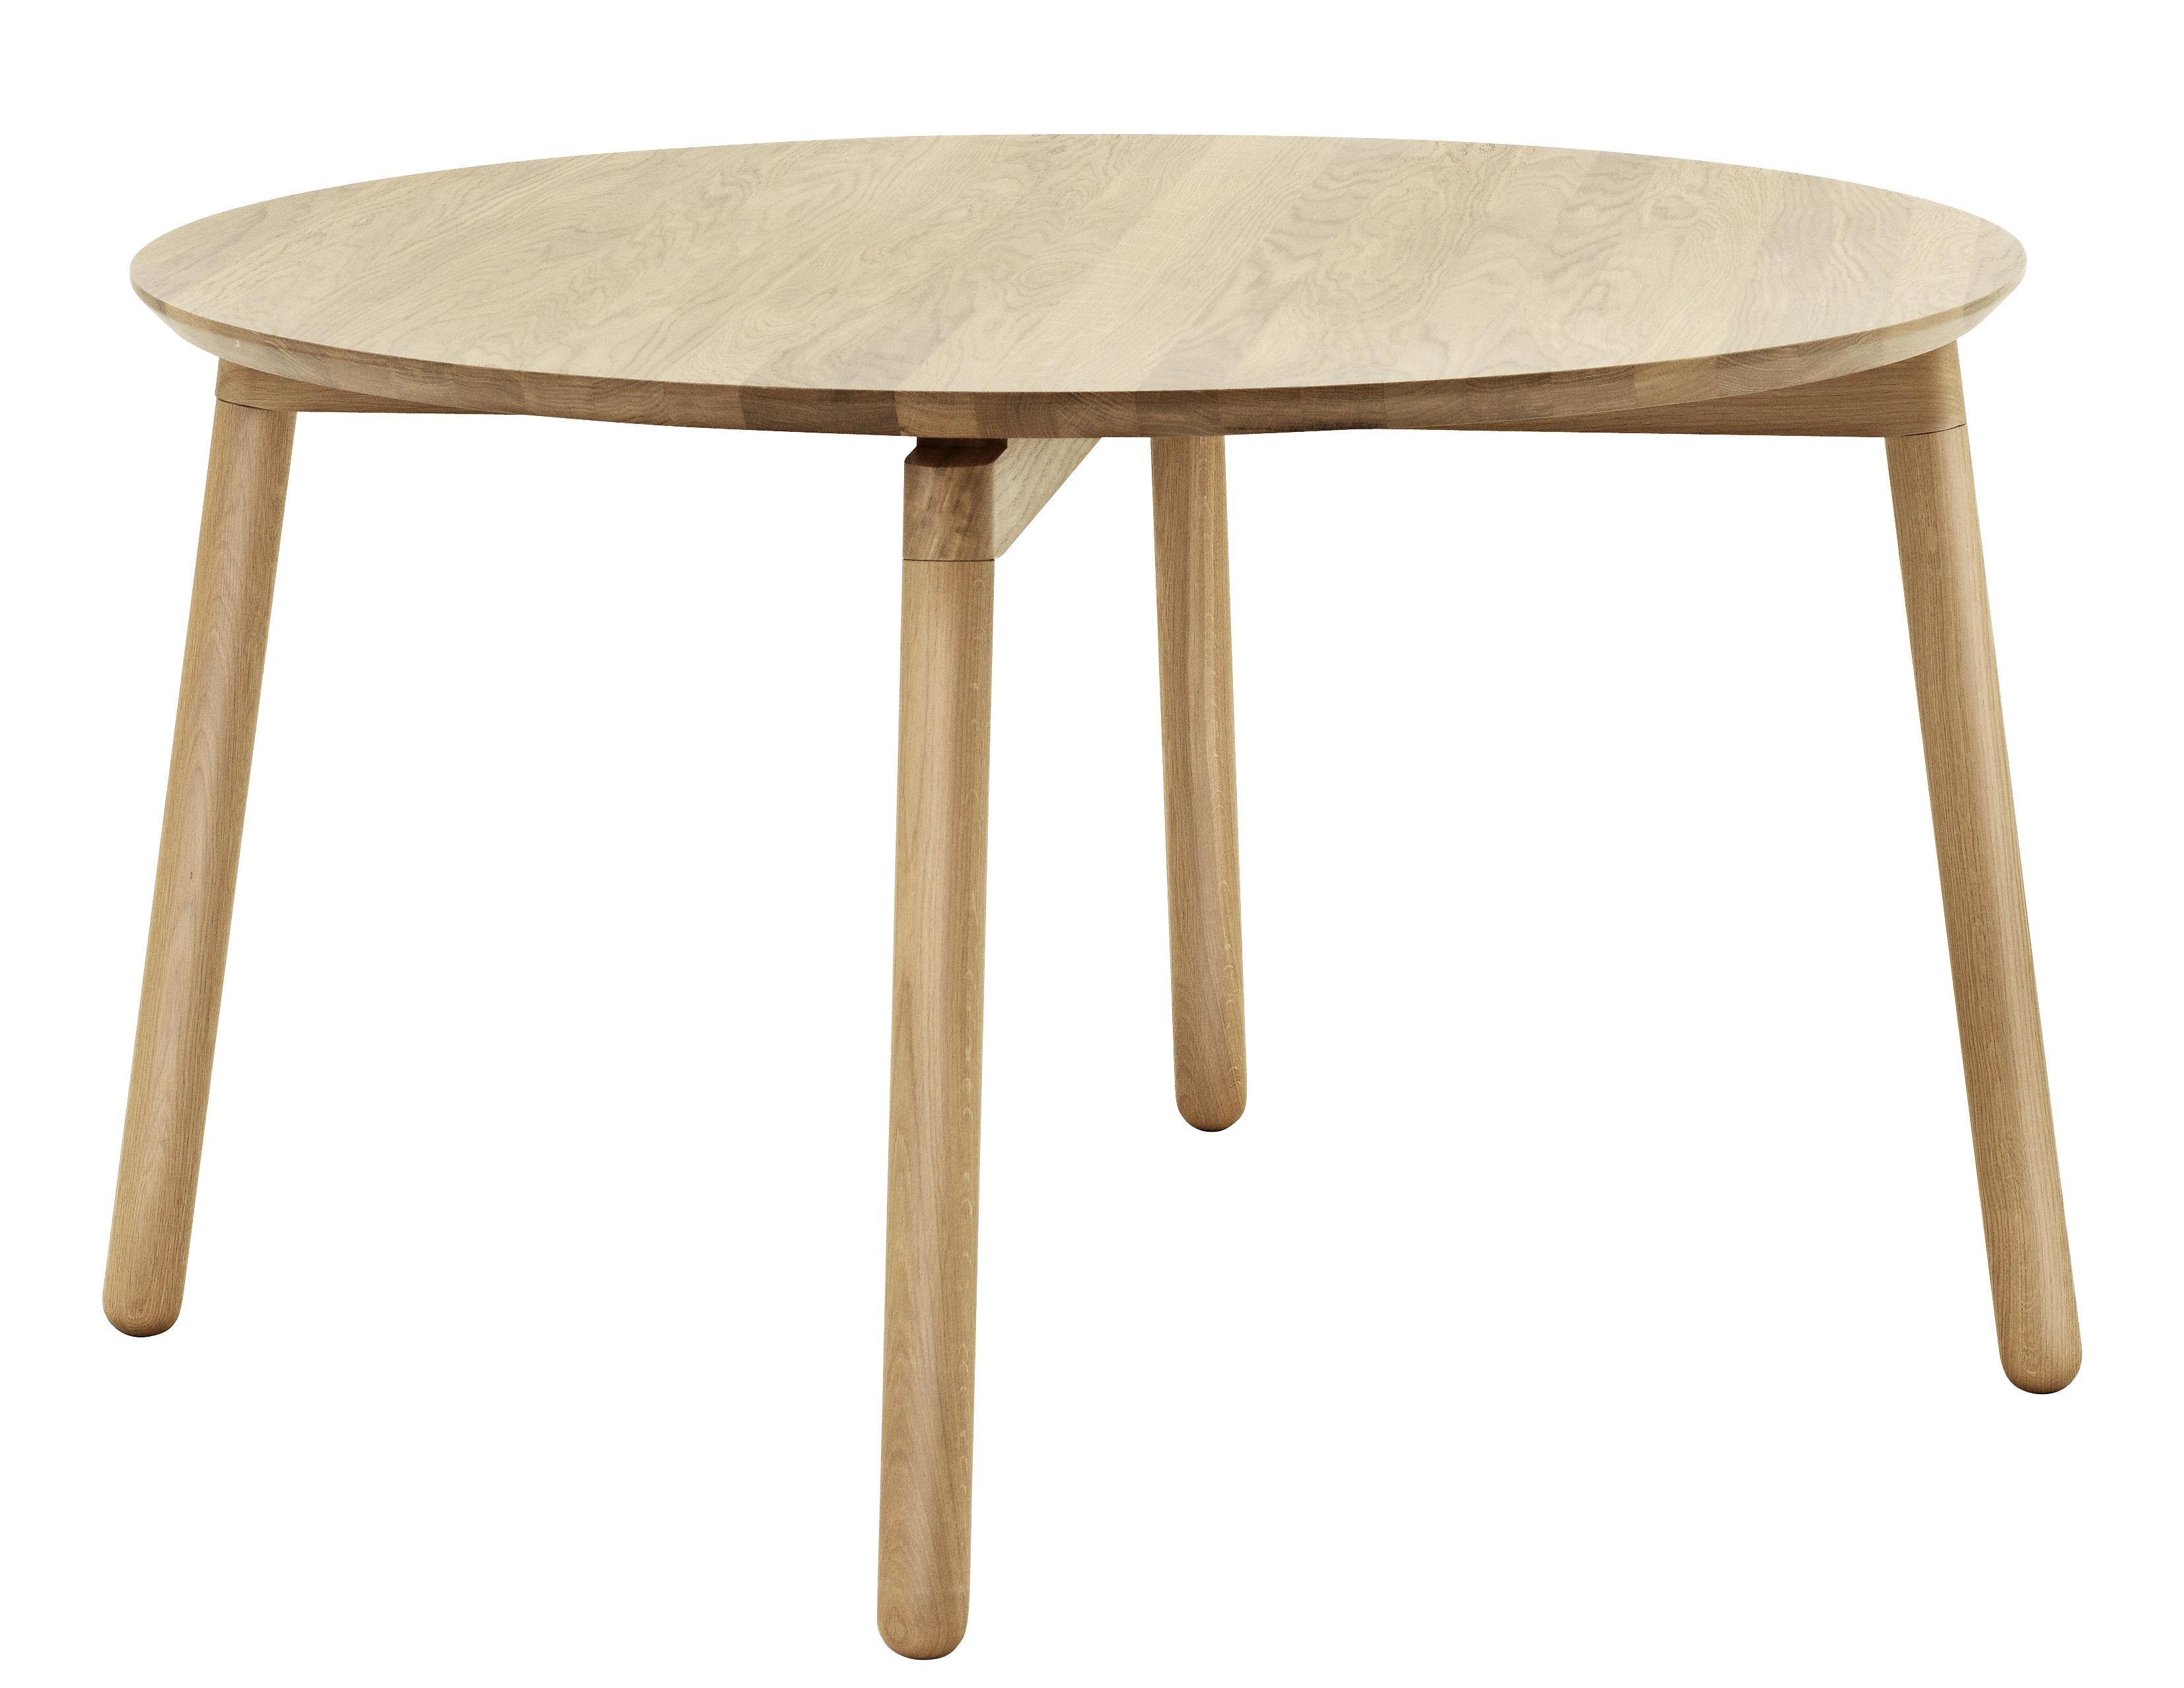 nord 120 cm normann copenhagen tisch. Black Bedroom Furniture Sets. Home Design Ideas